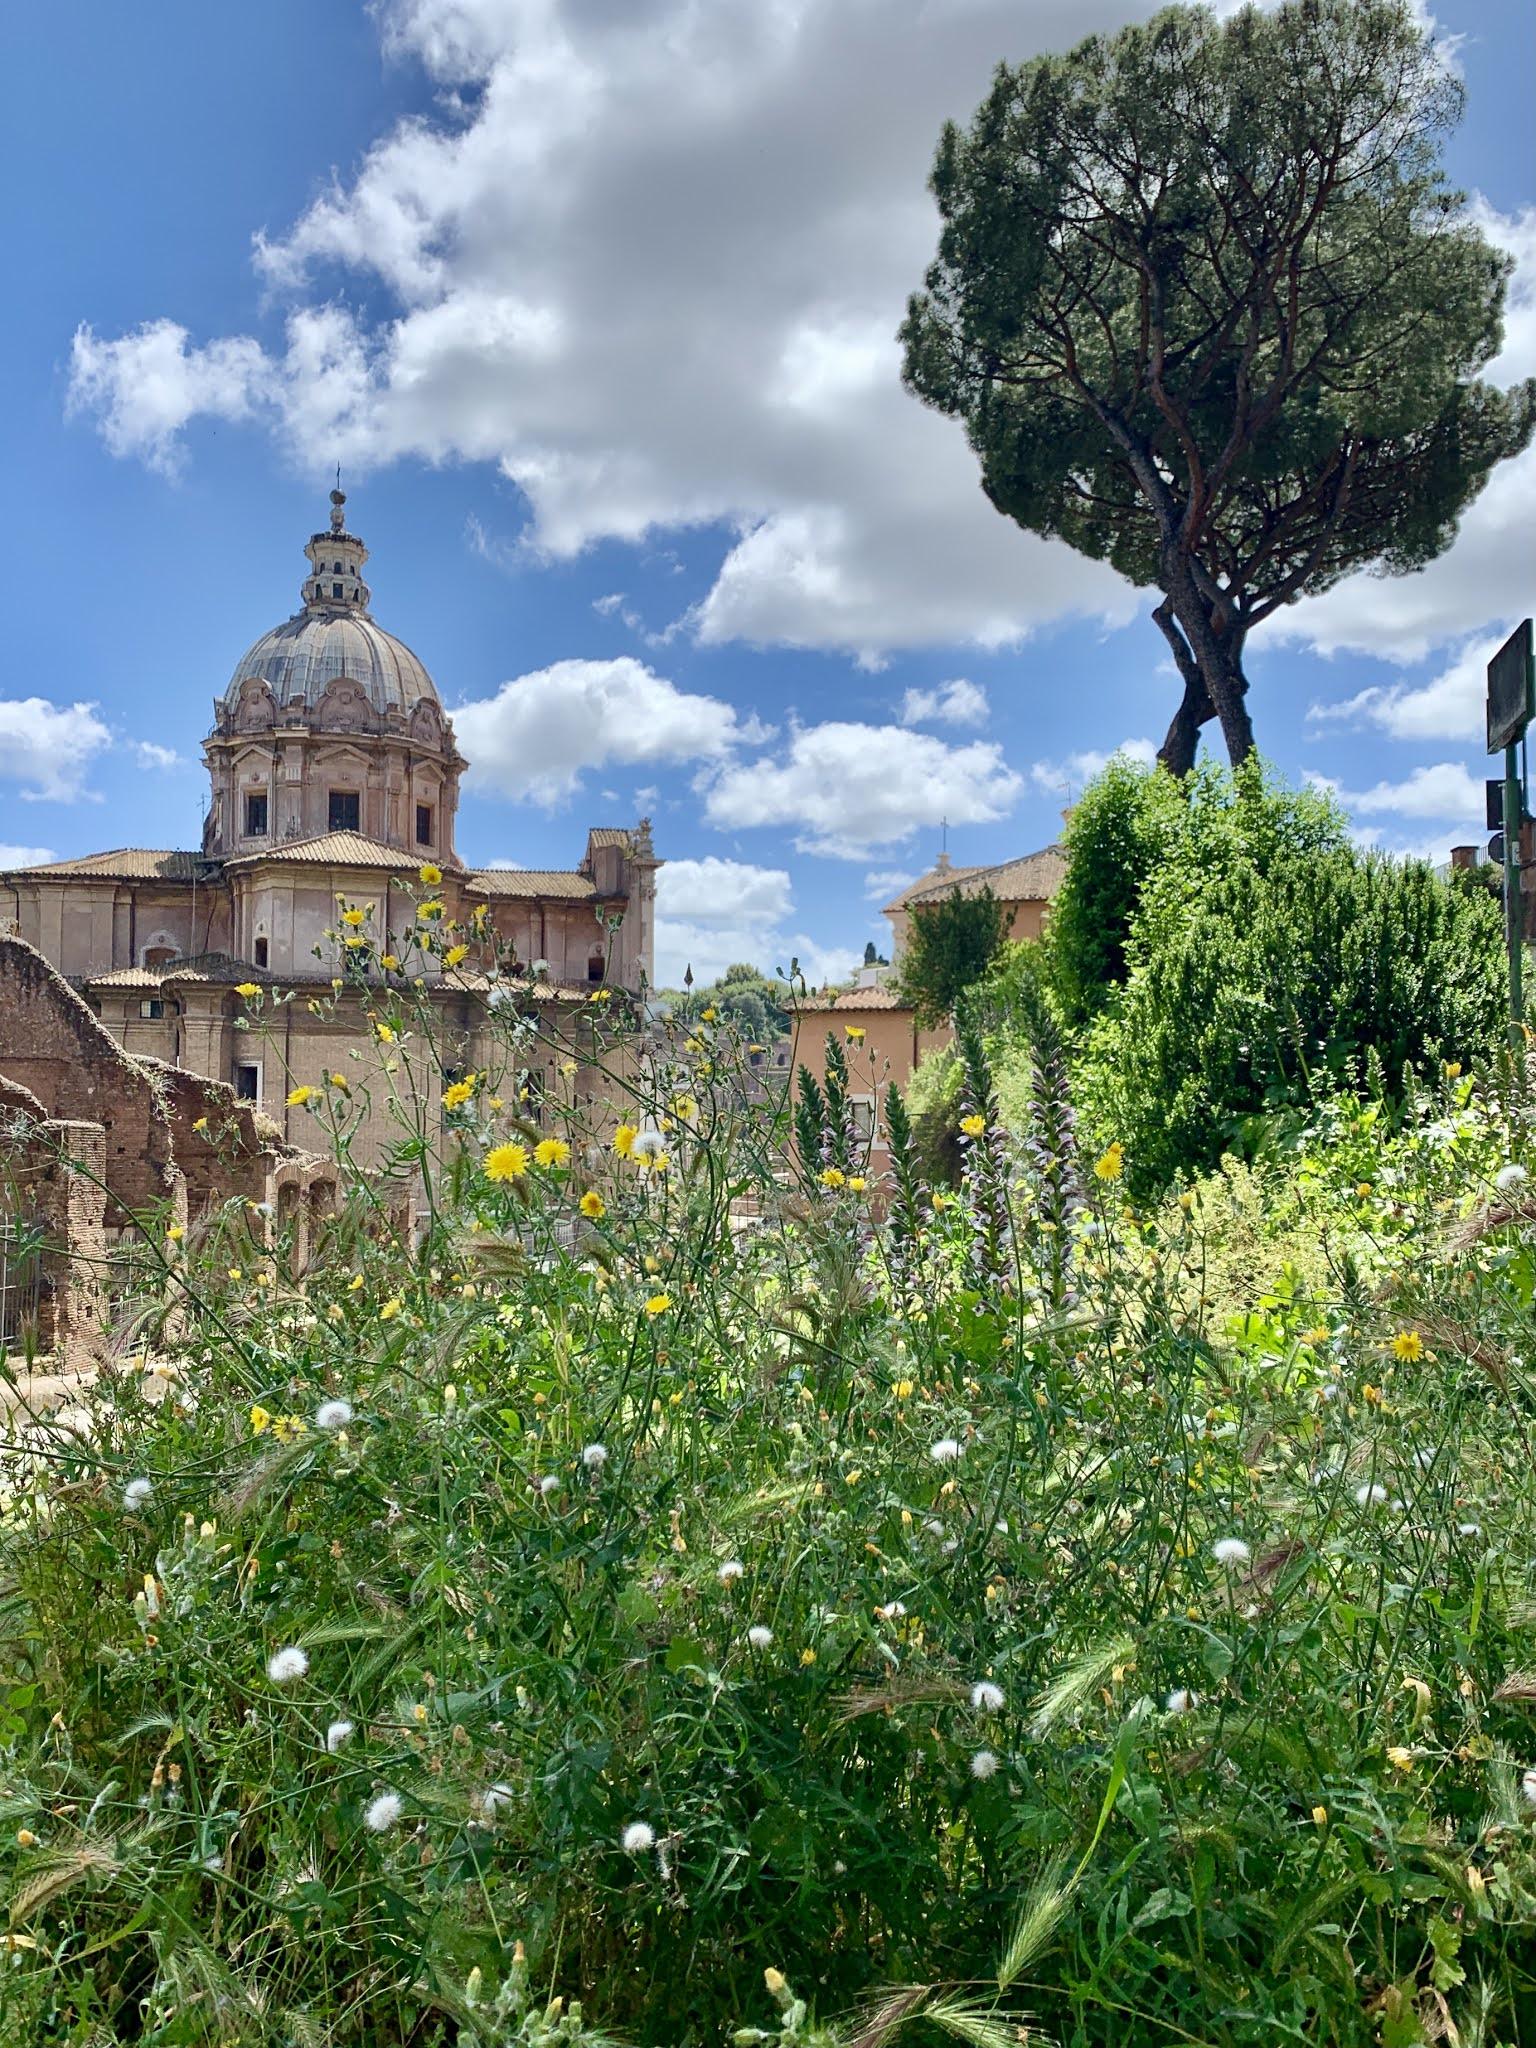 weeds & wildflowers in the Roman Forum